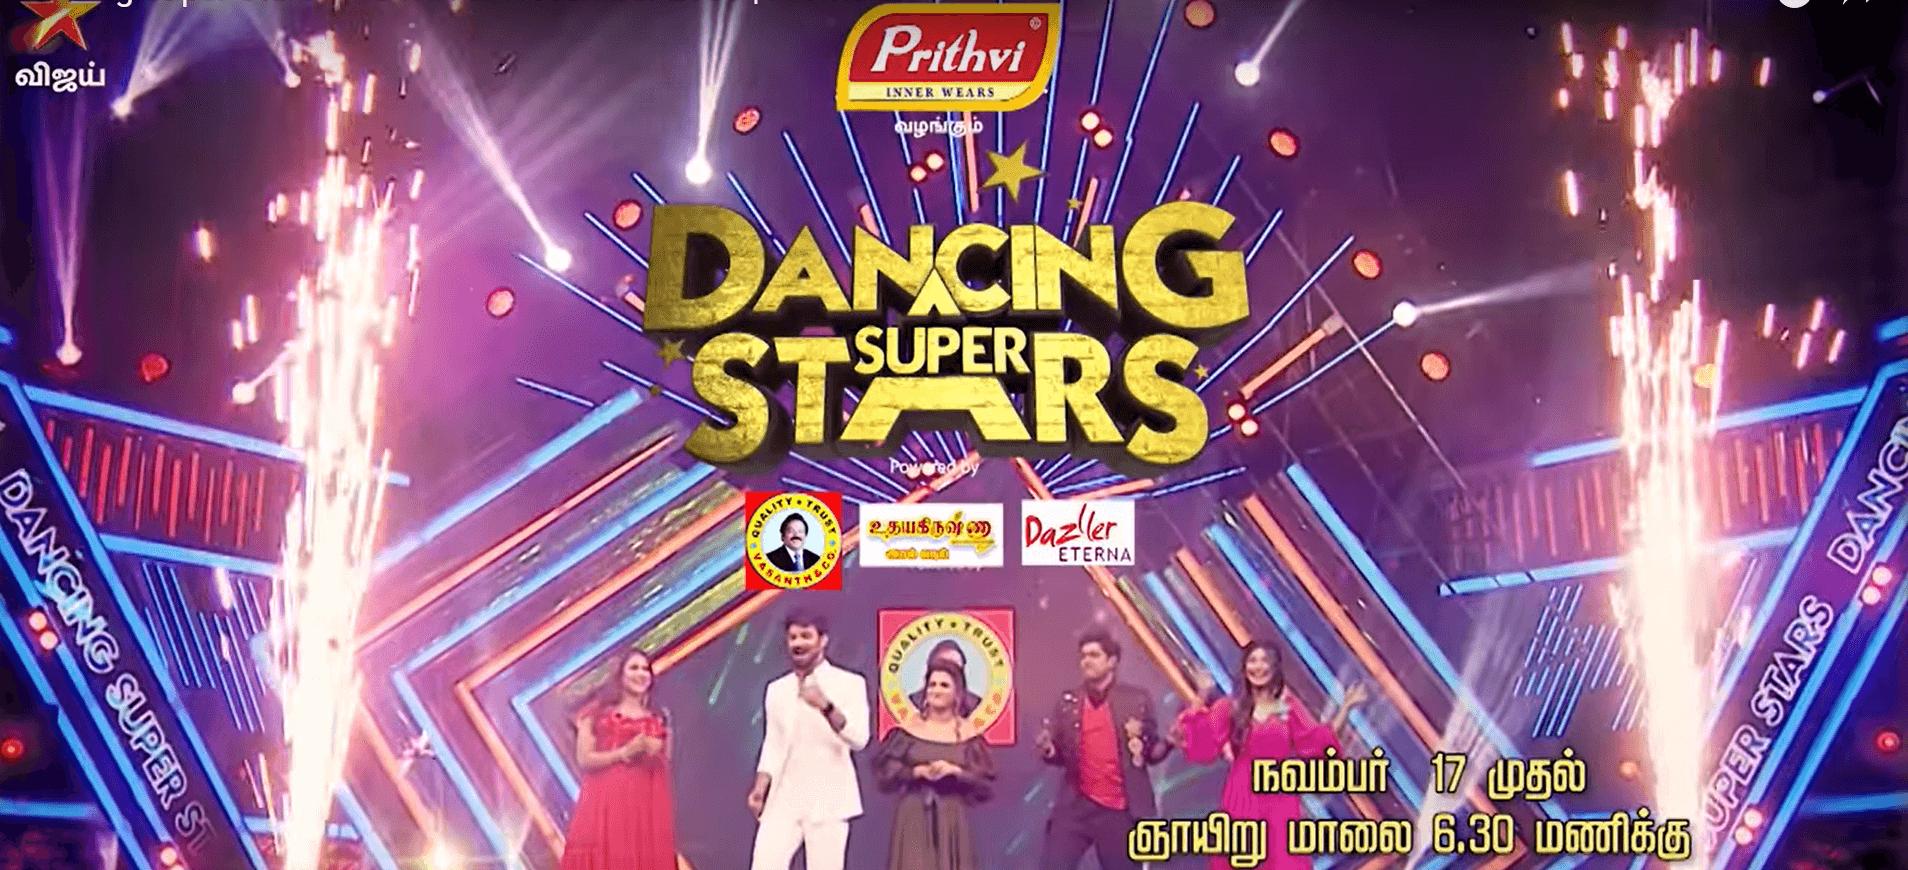 Vijay TV Dancing Super Stars Grand Finale Live Stream: Winner Name, Runner Up, Prize Money Revealed | Check Out Full Details